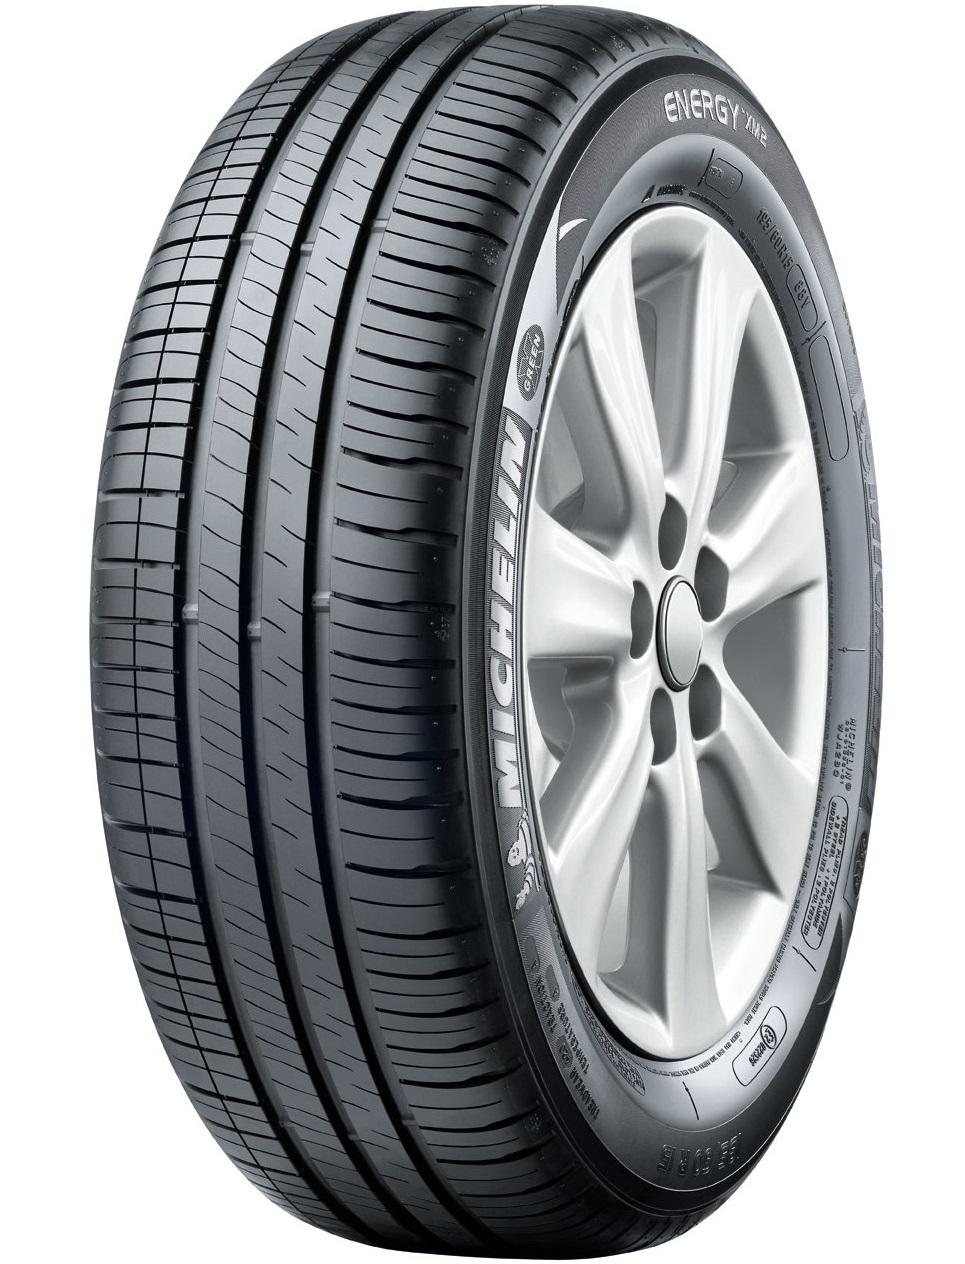 Michelin Energy XM2 165/70 R14 81T